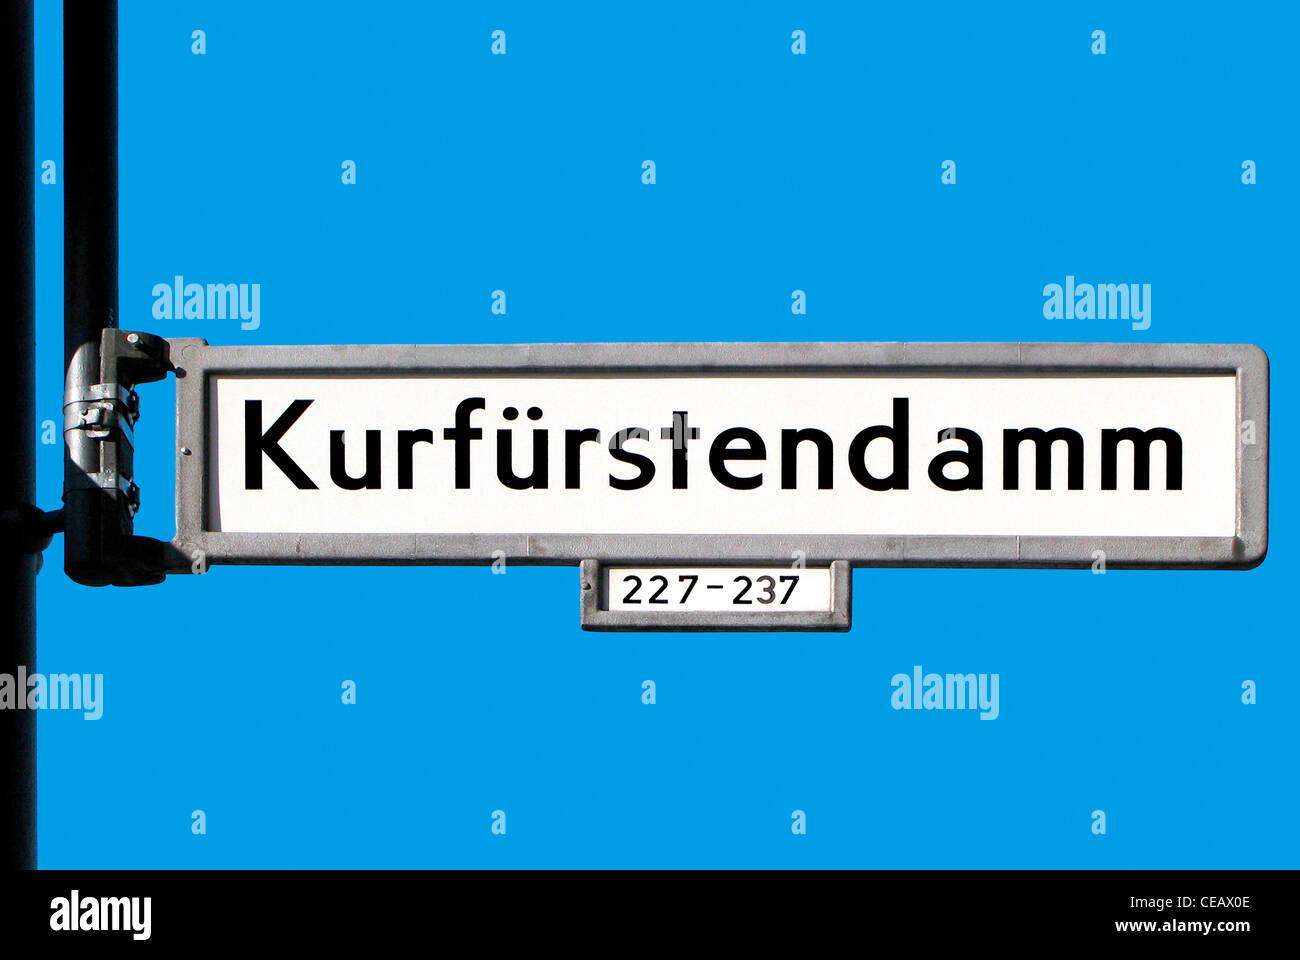 Street sign of the boulevard Kurfuerstendamm in Berlin. - Stock Image